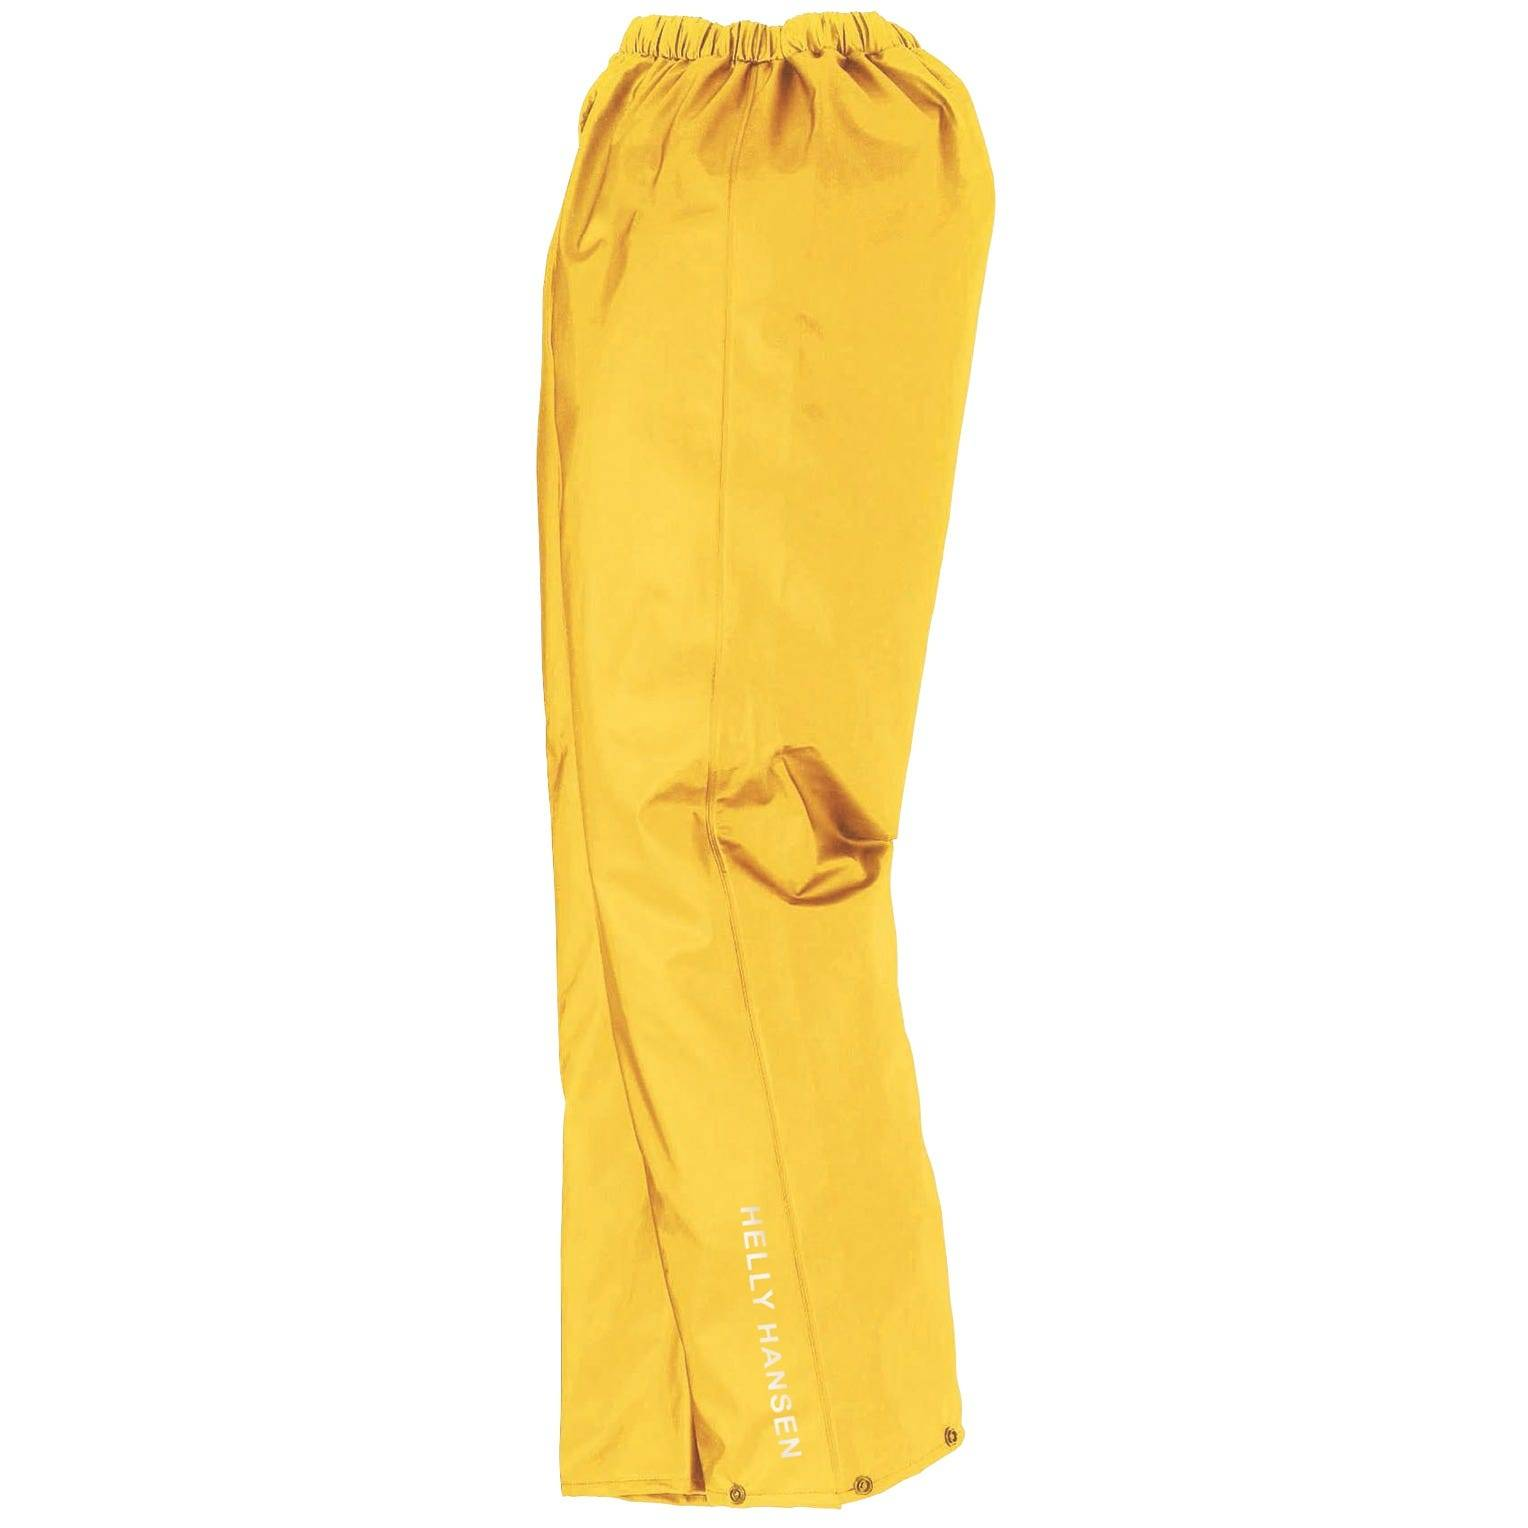 HH Workwear Helly Hansen WorkwearVoss Lightweight Windproof Rain Pants Yellow XXXXL